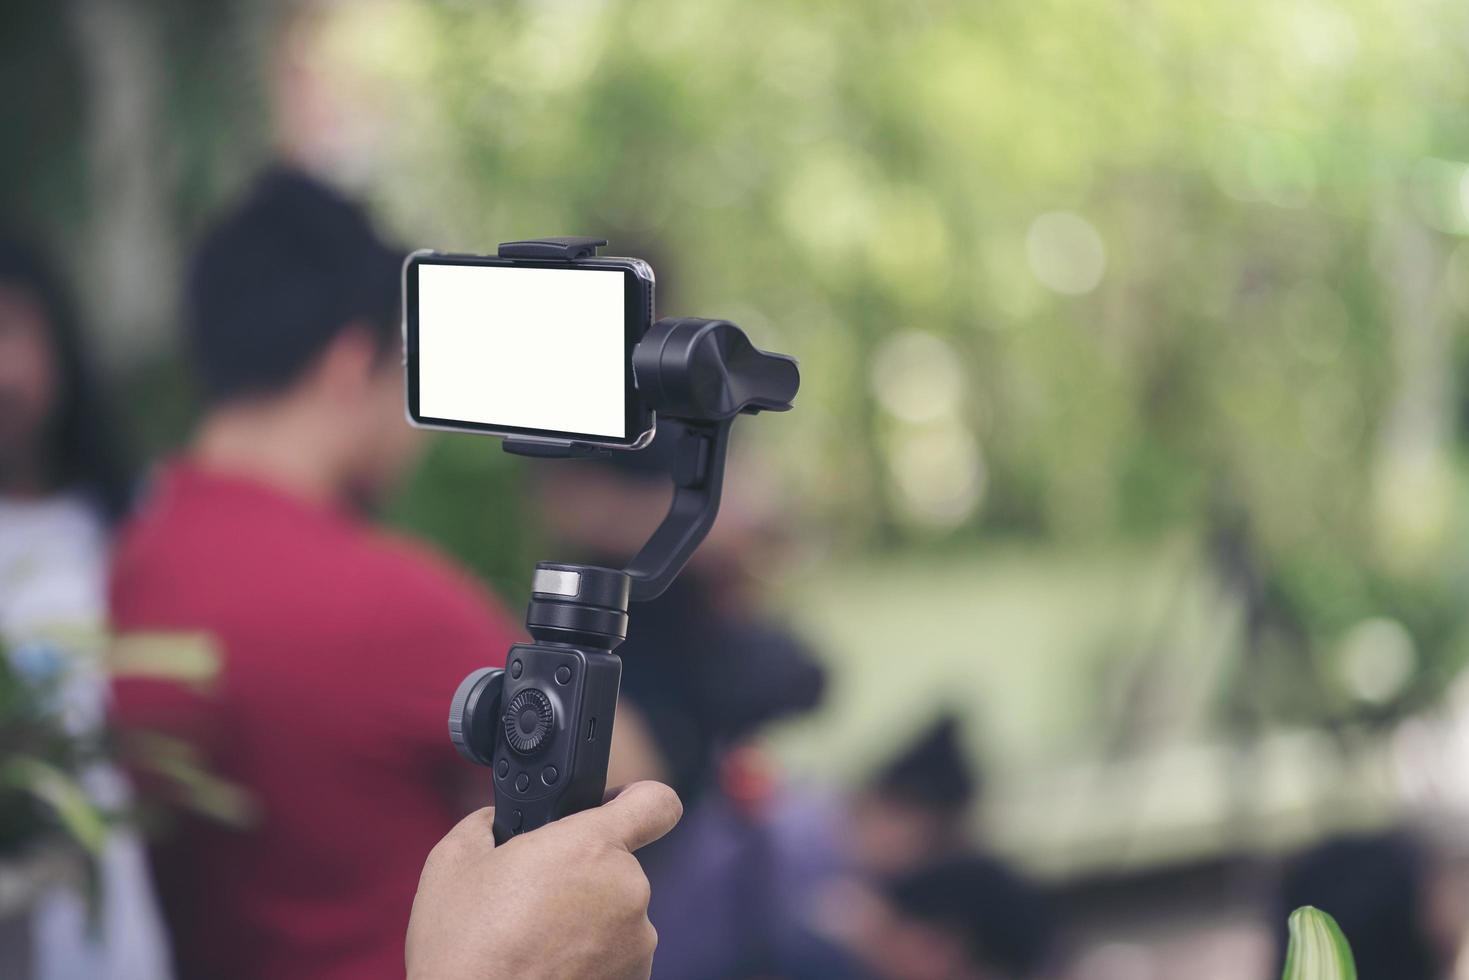 mano sujetando gimbal con smartphone foto